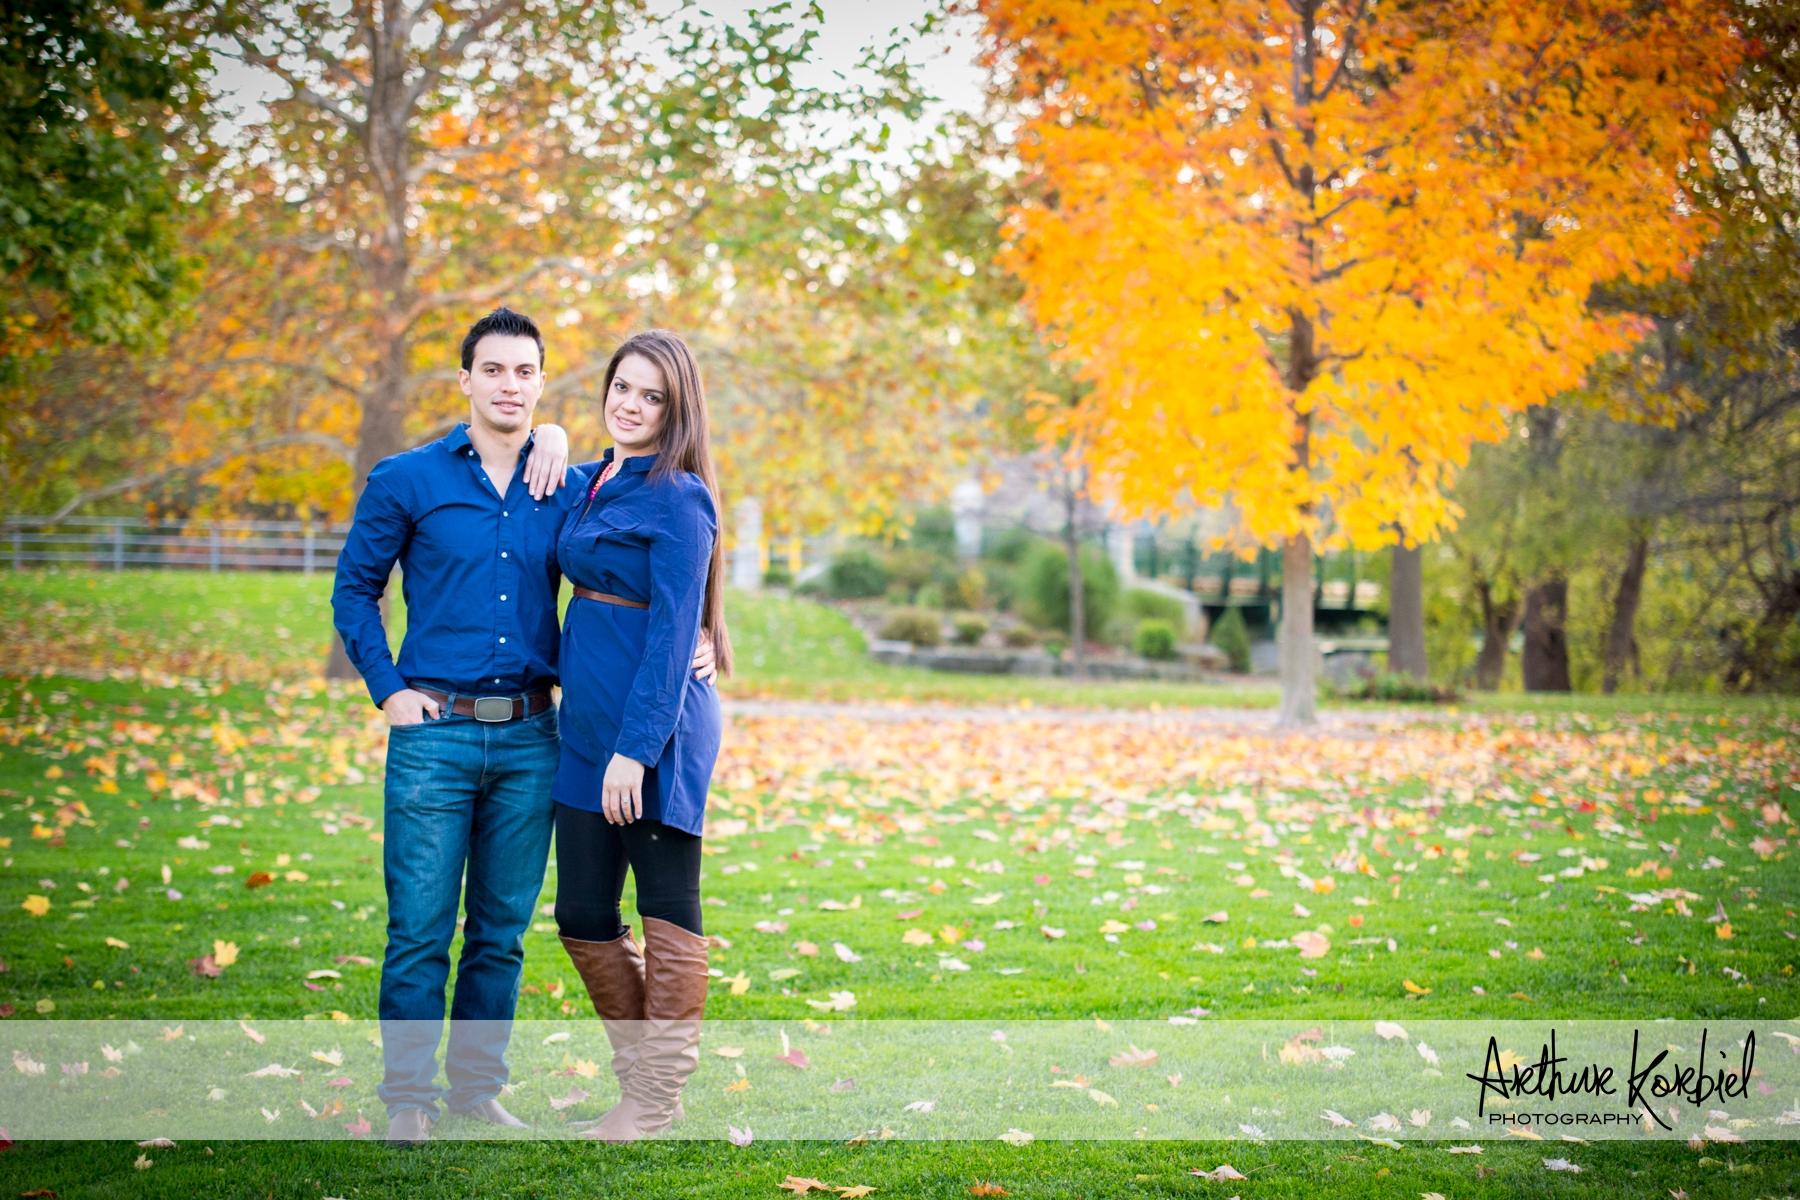 Arthur Korbiel Photography - London Engagement Photographer - Maria & Jose-011.jpg